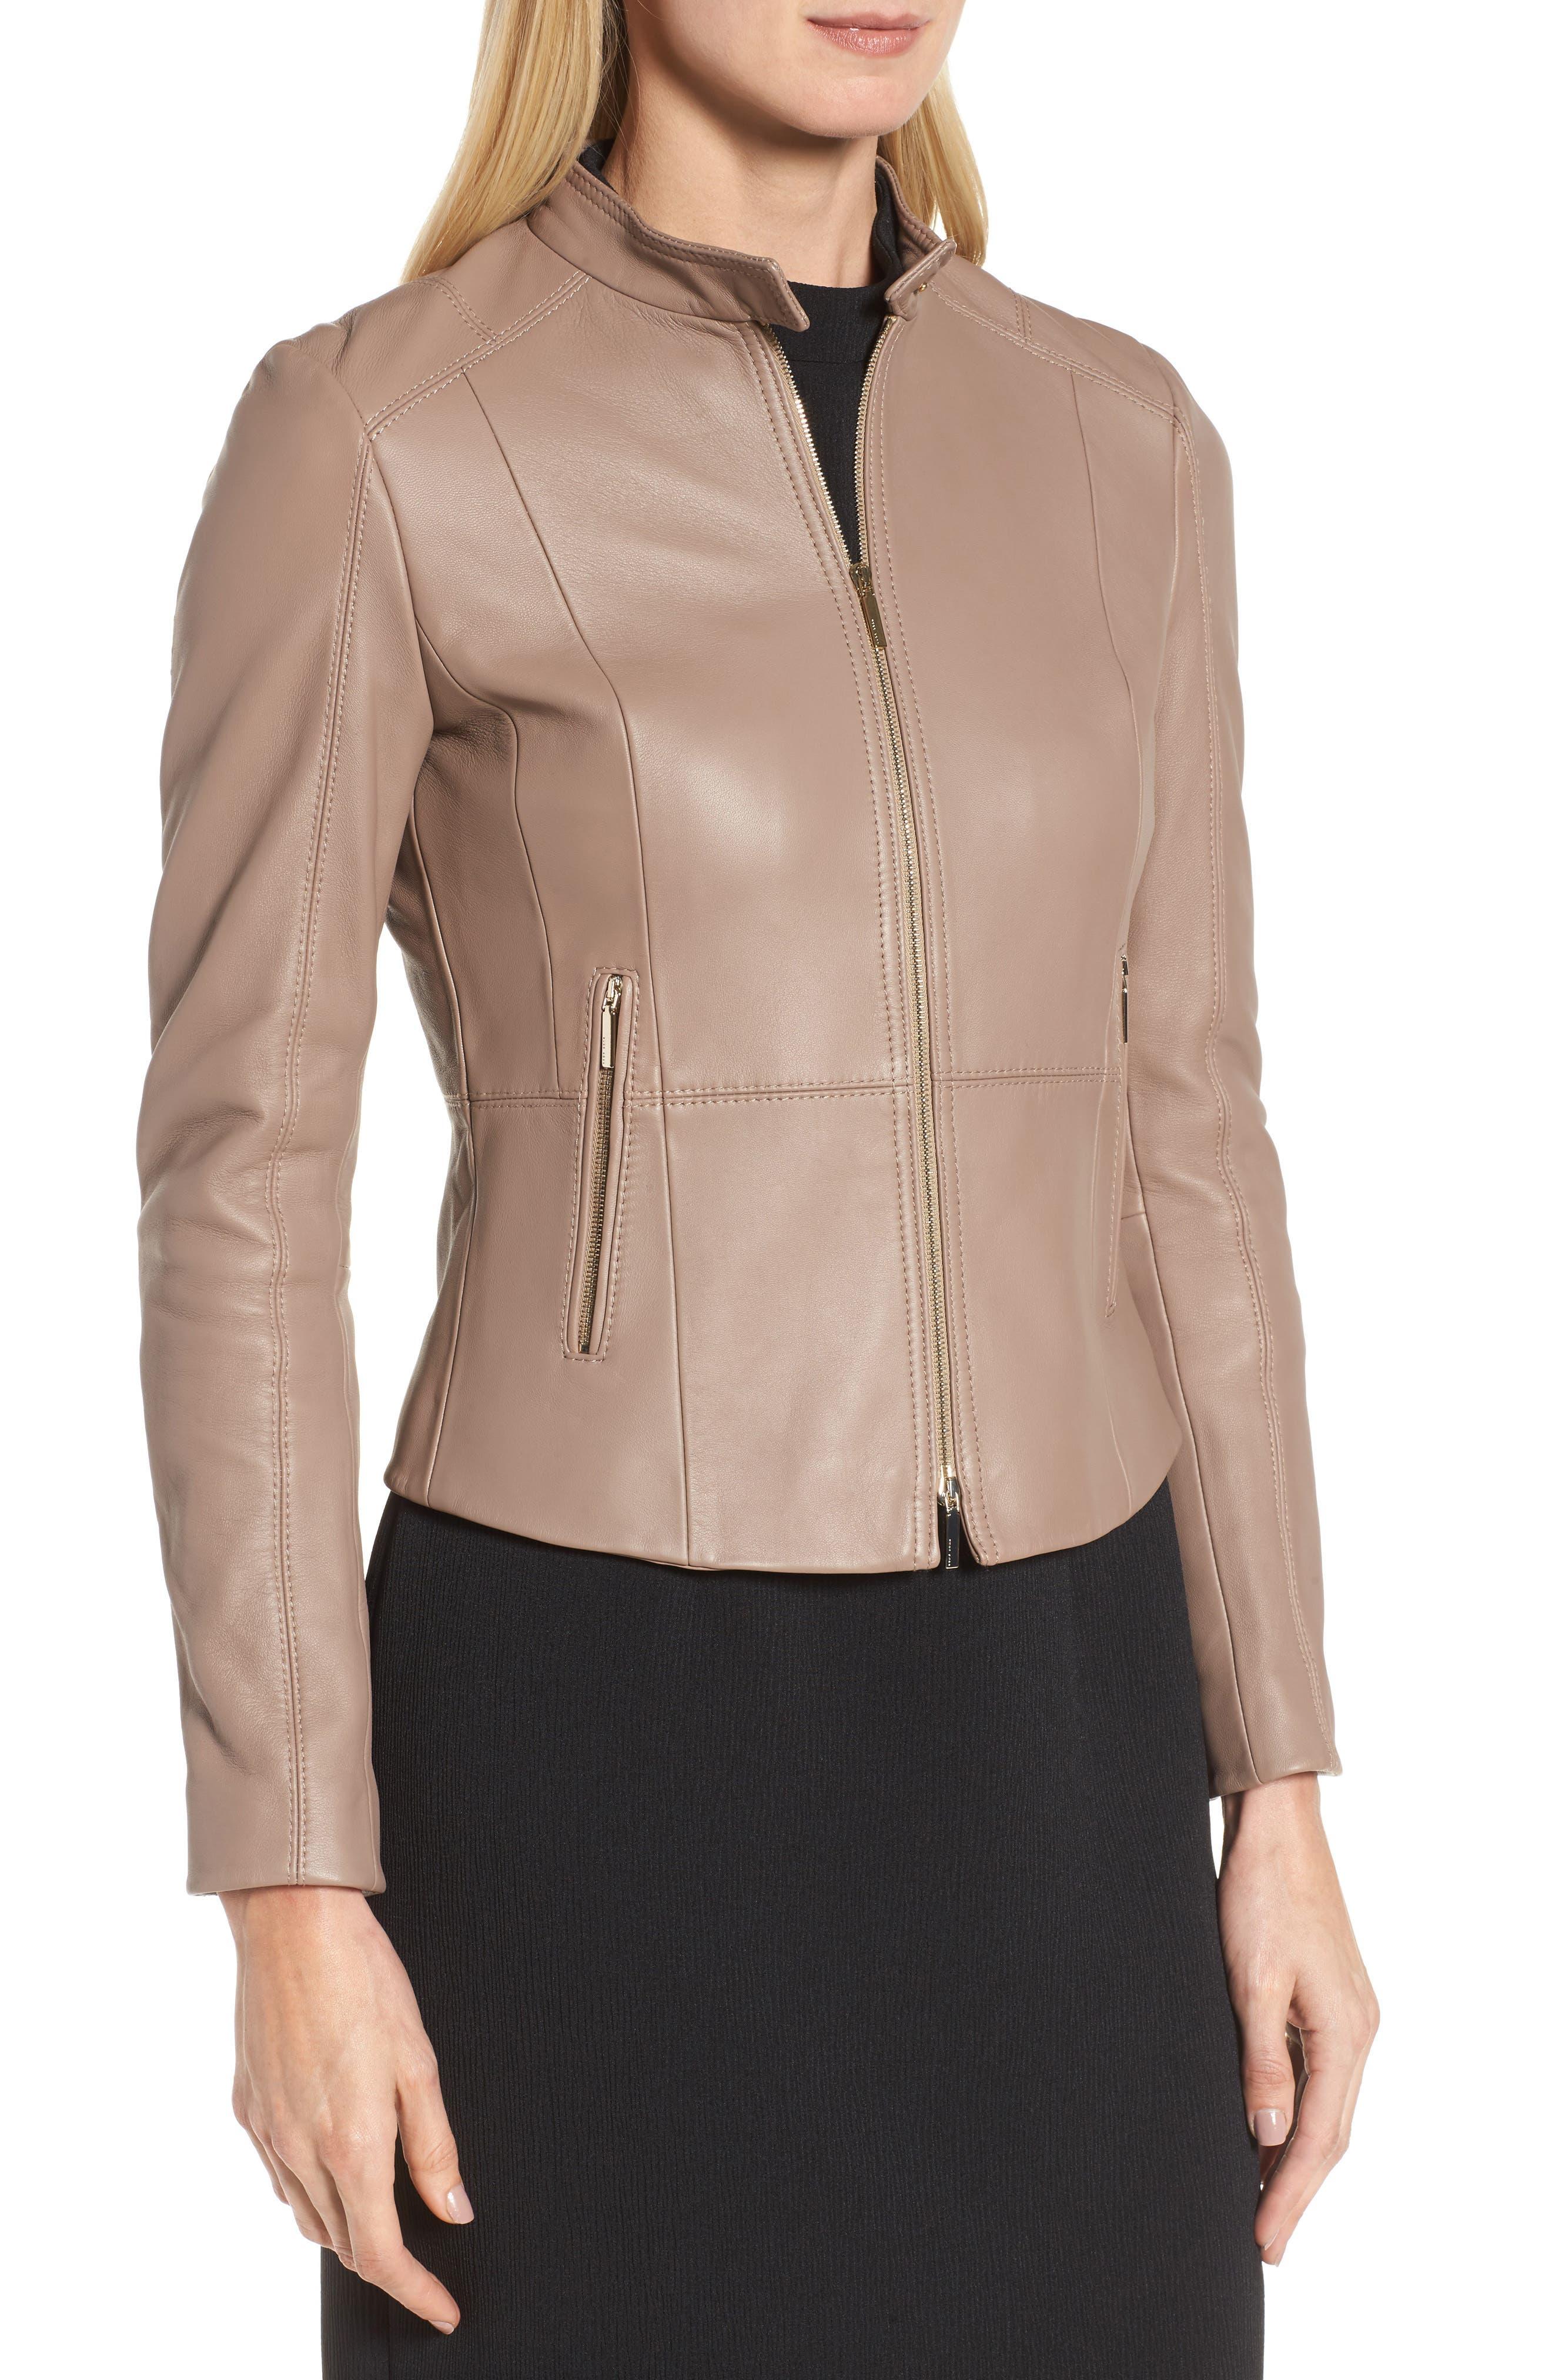 Sammonaie Leather Jacket,                             Alternate thumbnail 7, color,